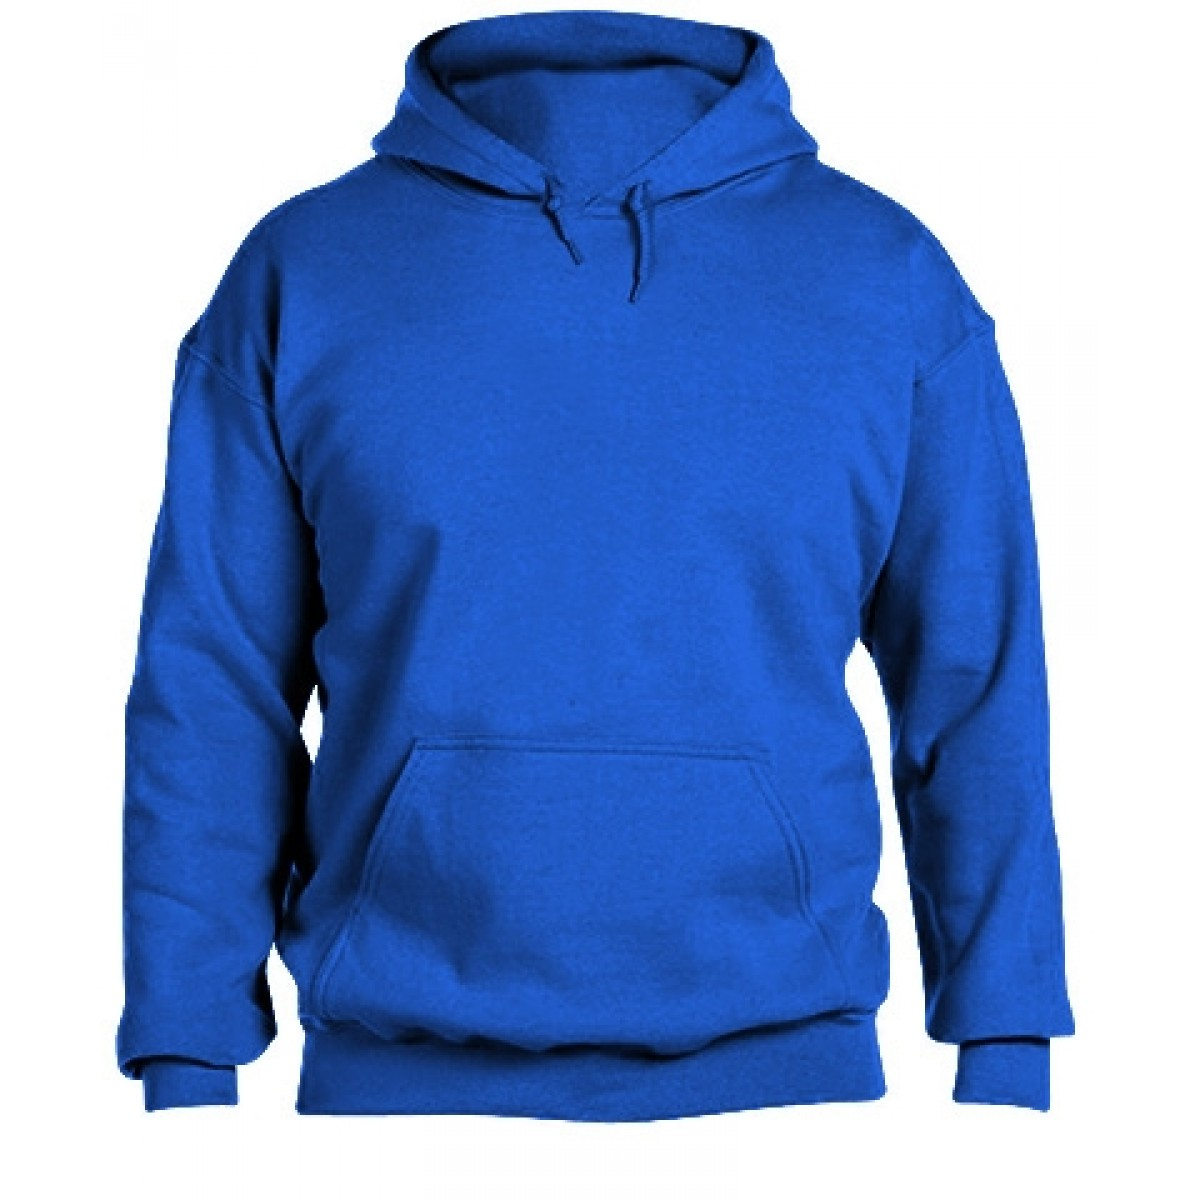 Solid Hooded Sweatshirt  50/50 Heavy Blend-Royal Blue-YL